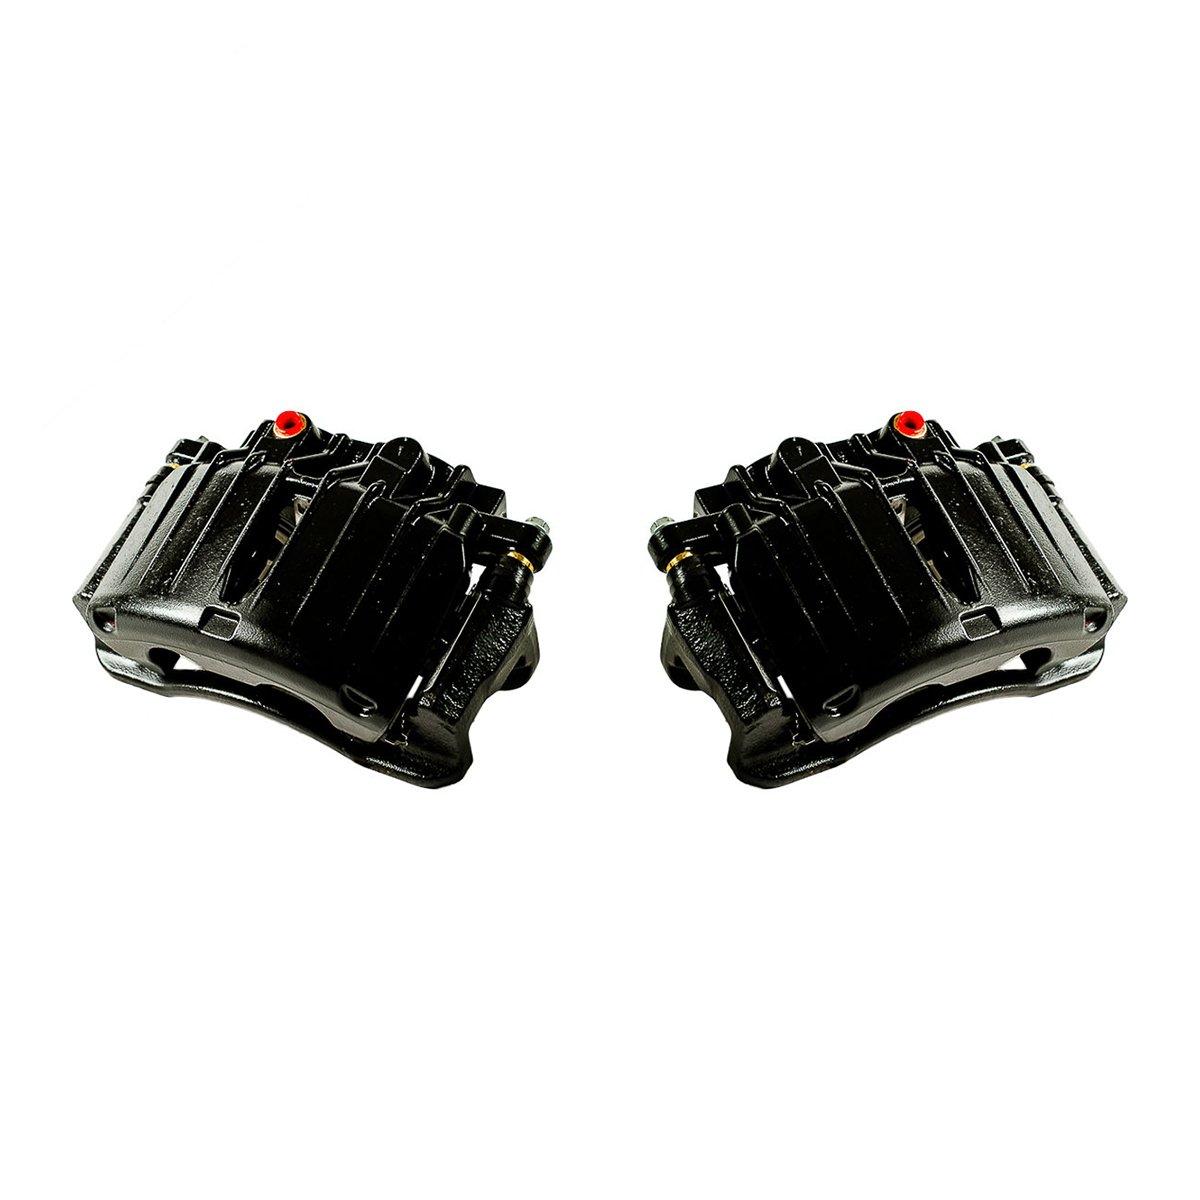 CK00972 [ 2 ] REAR Performance Grade Black Powder Coated Semi-Loaded Caliper Assembly Pair Set Callahan Brake Parts